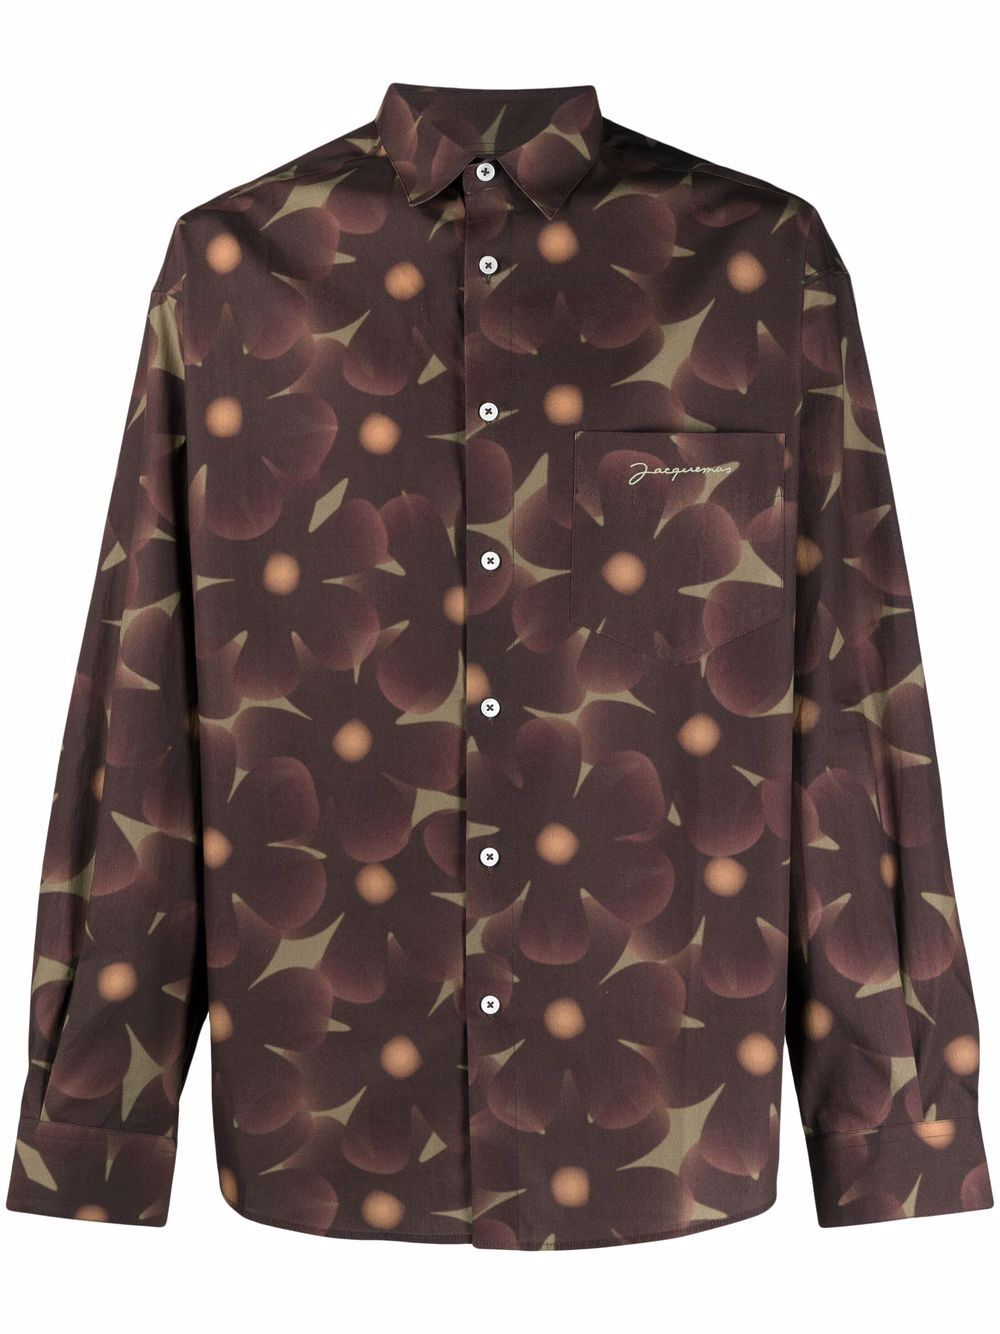 la chemise simon shirt man brown in cotton JACQUEMUS   Shirts   216SH01-2168AG